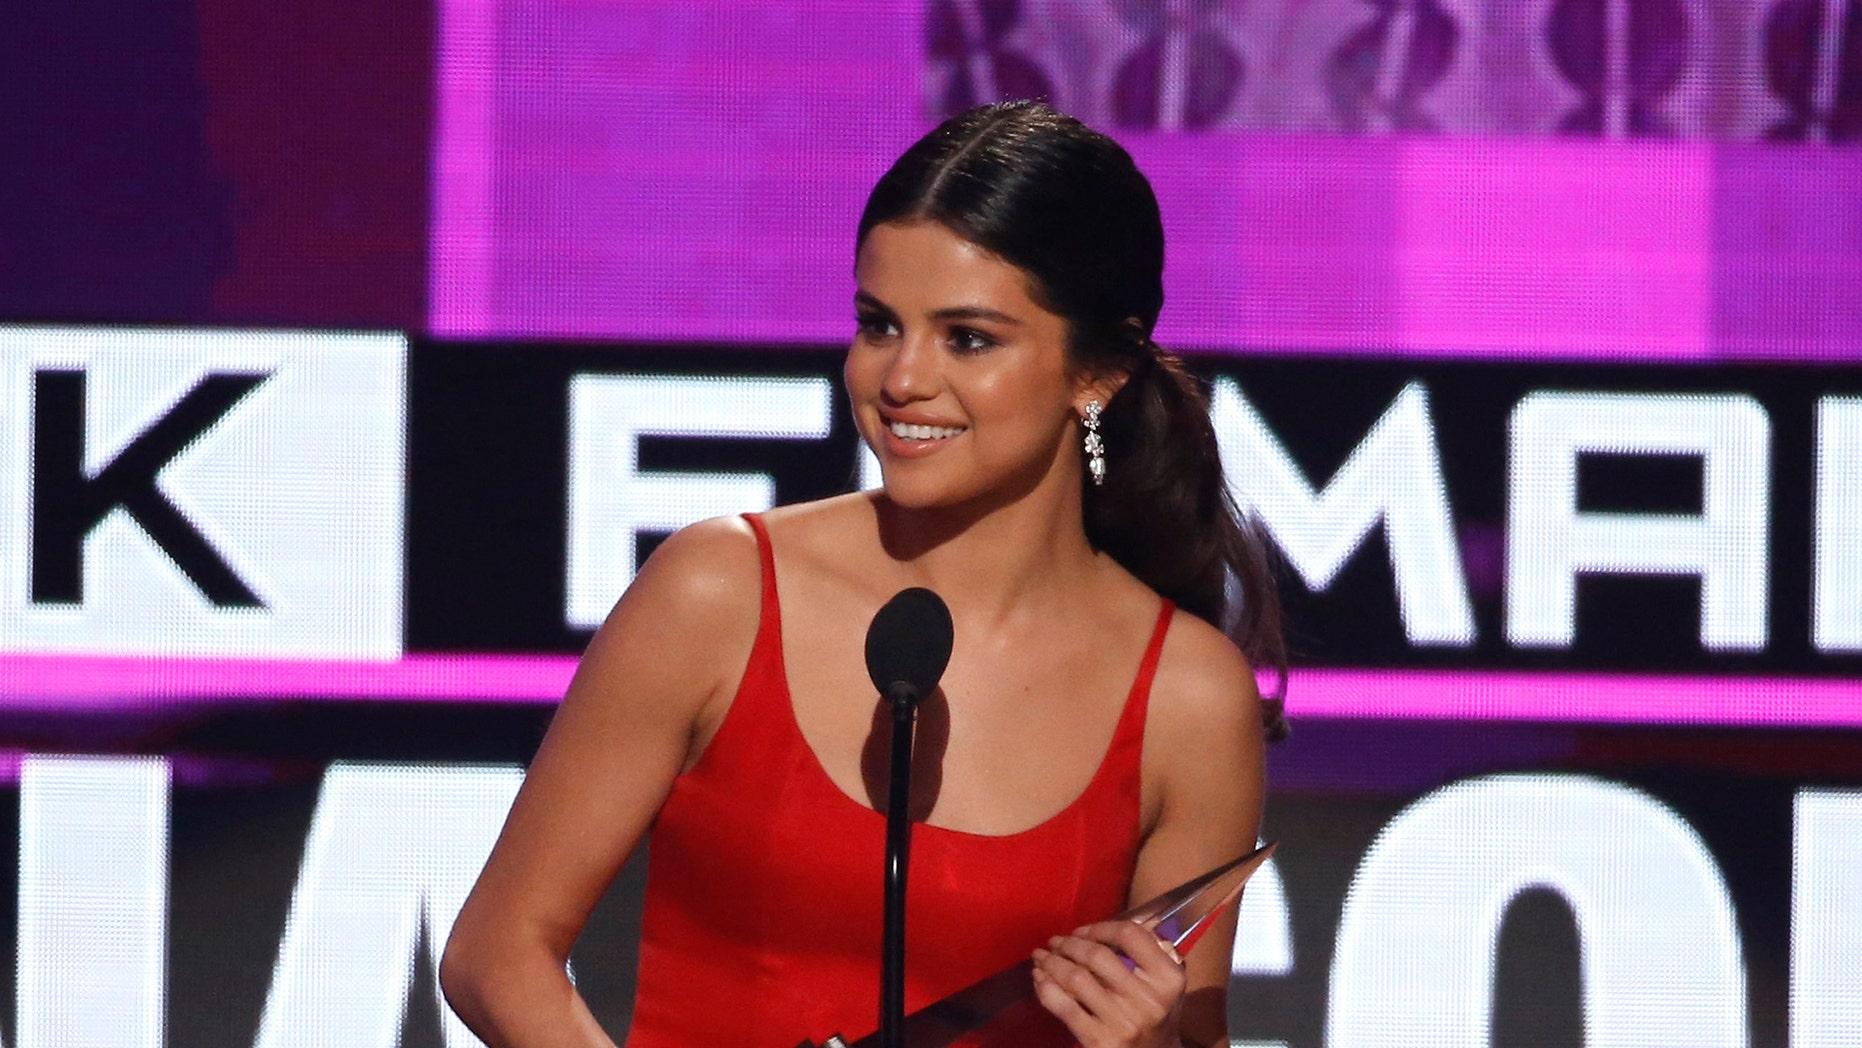 Selena Gomez accepts the award for favorite female pop/rock artist at the 2016 American Music Awards in Los Angeles, California, U.S., November 20, 2016.